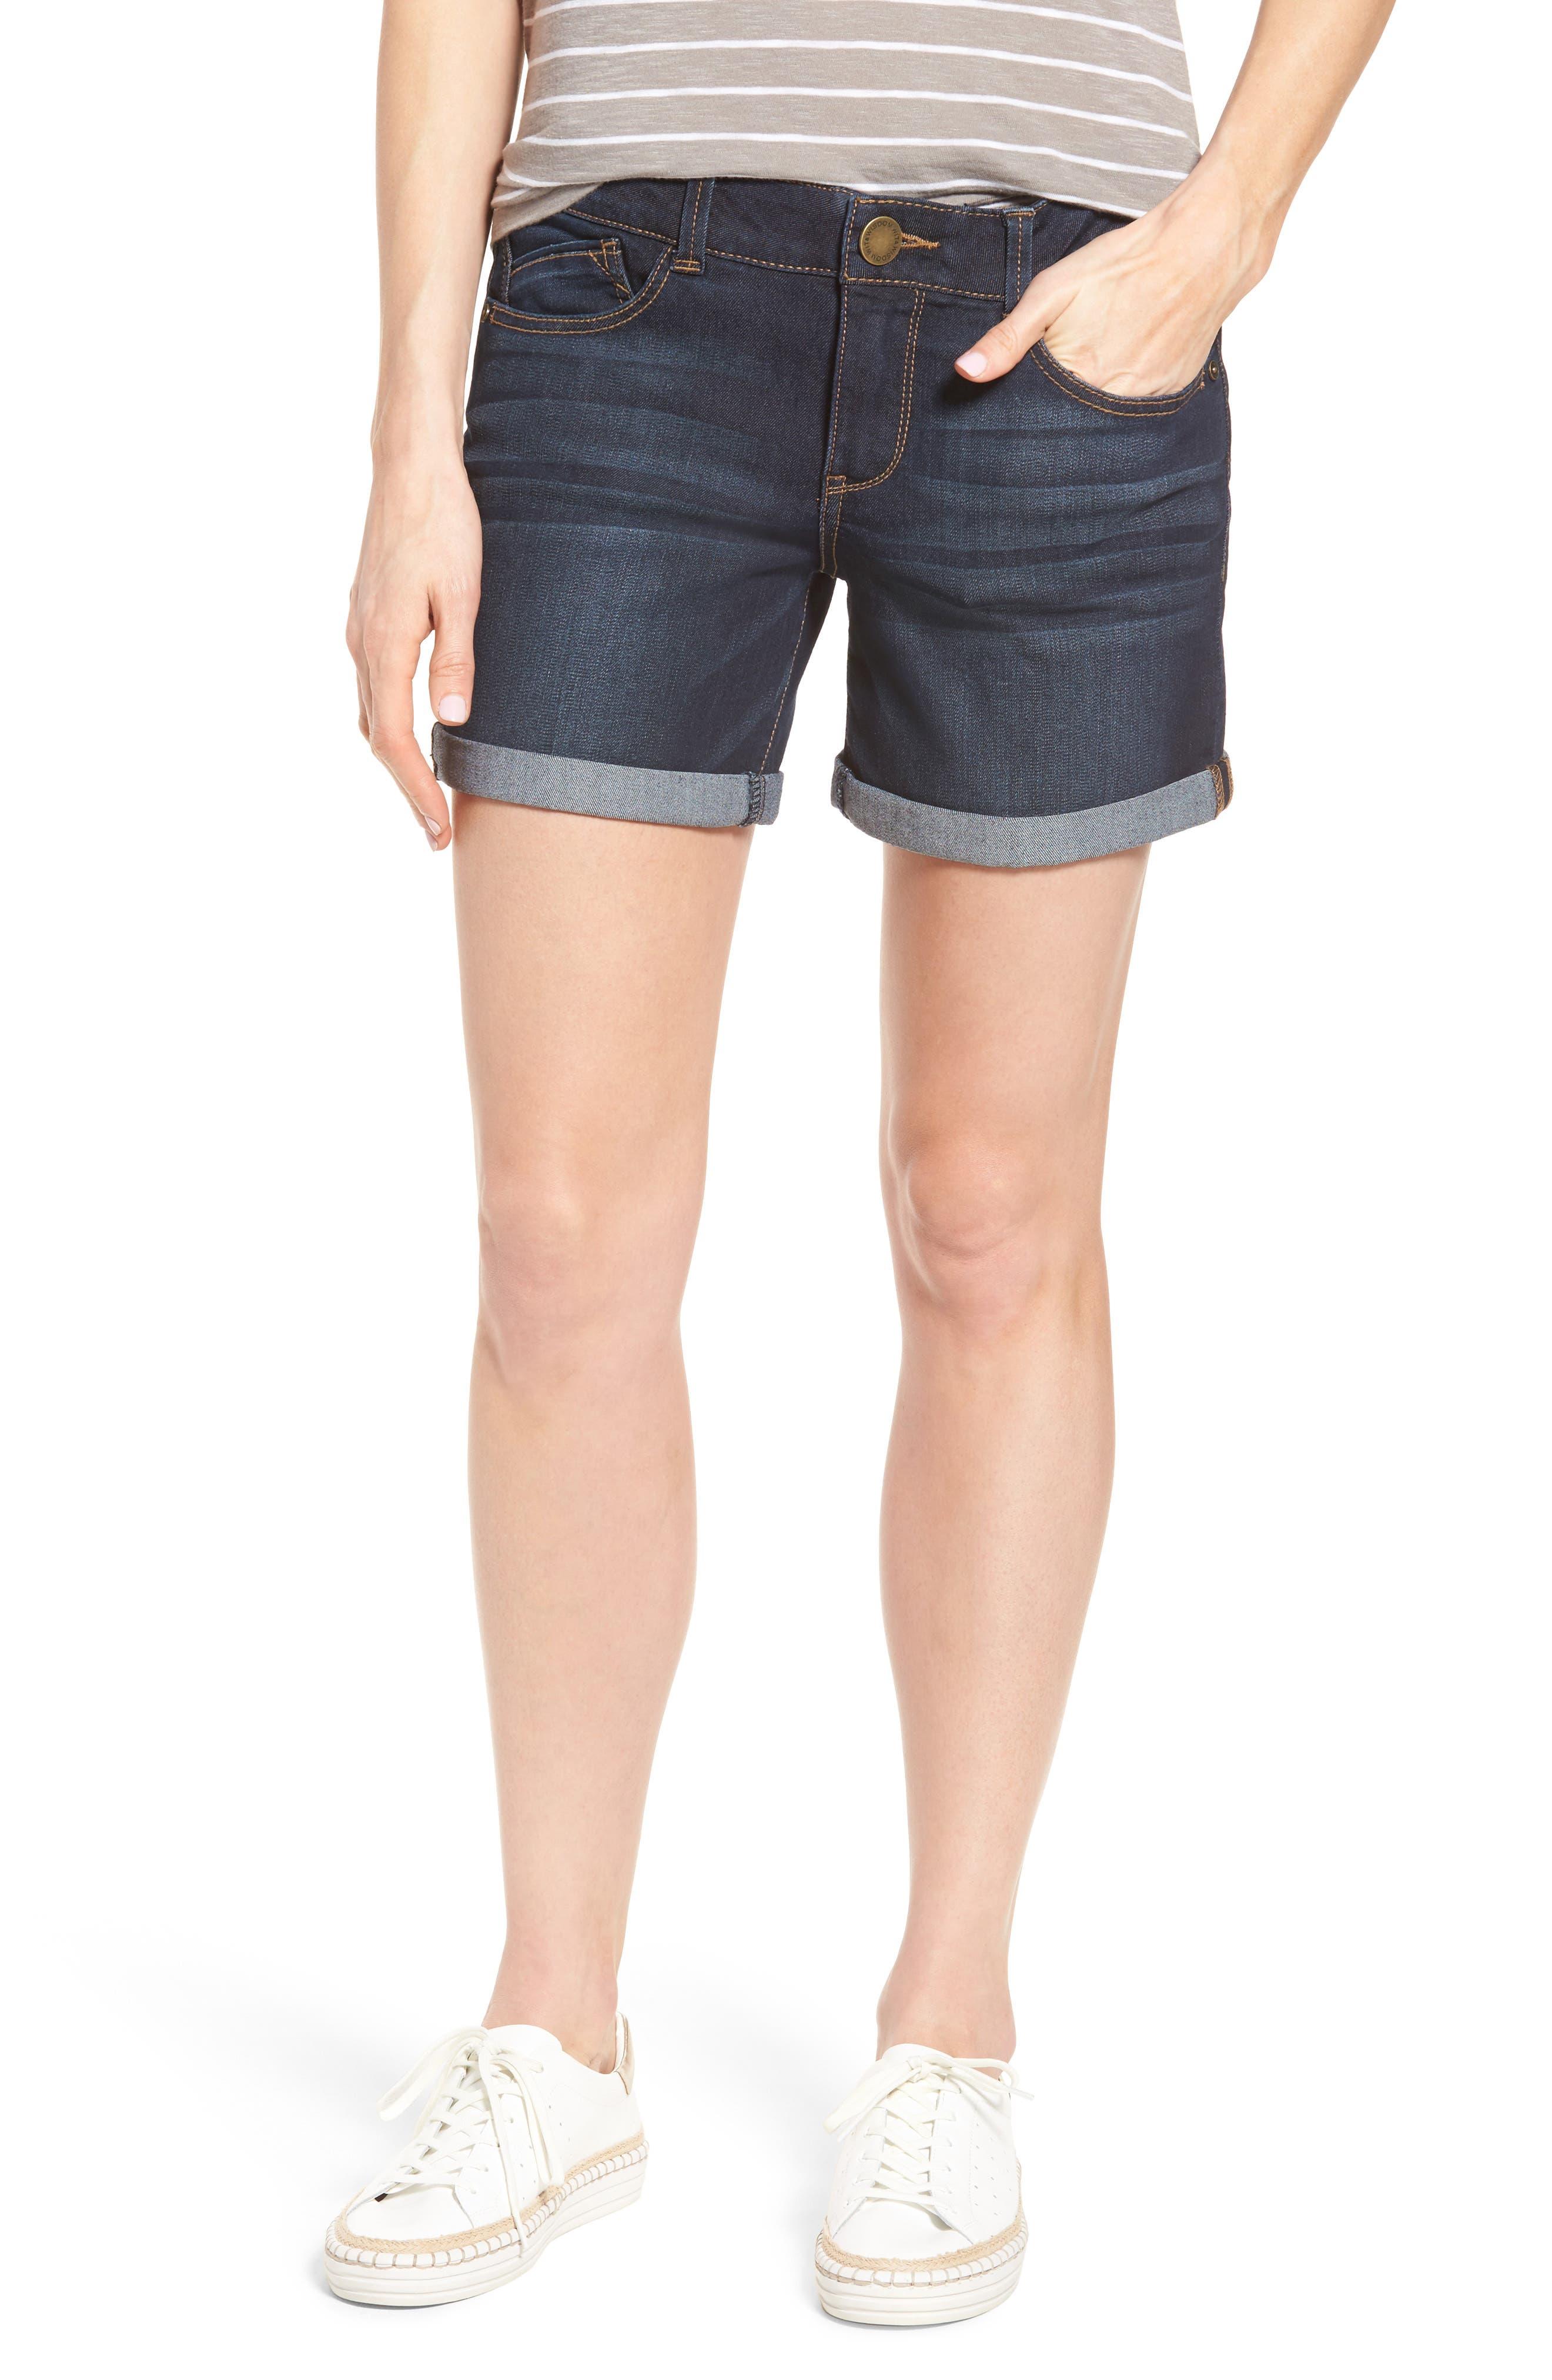 Ab-solution Cuffed Denim Shorts,                             Main thumbnail 1, color,                             Indigo